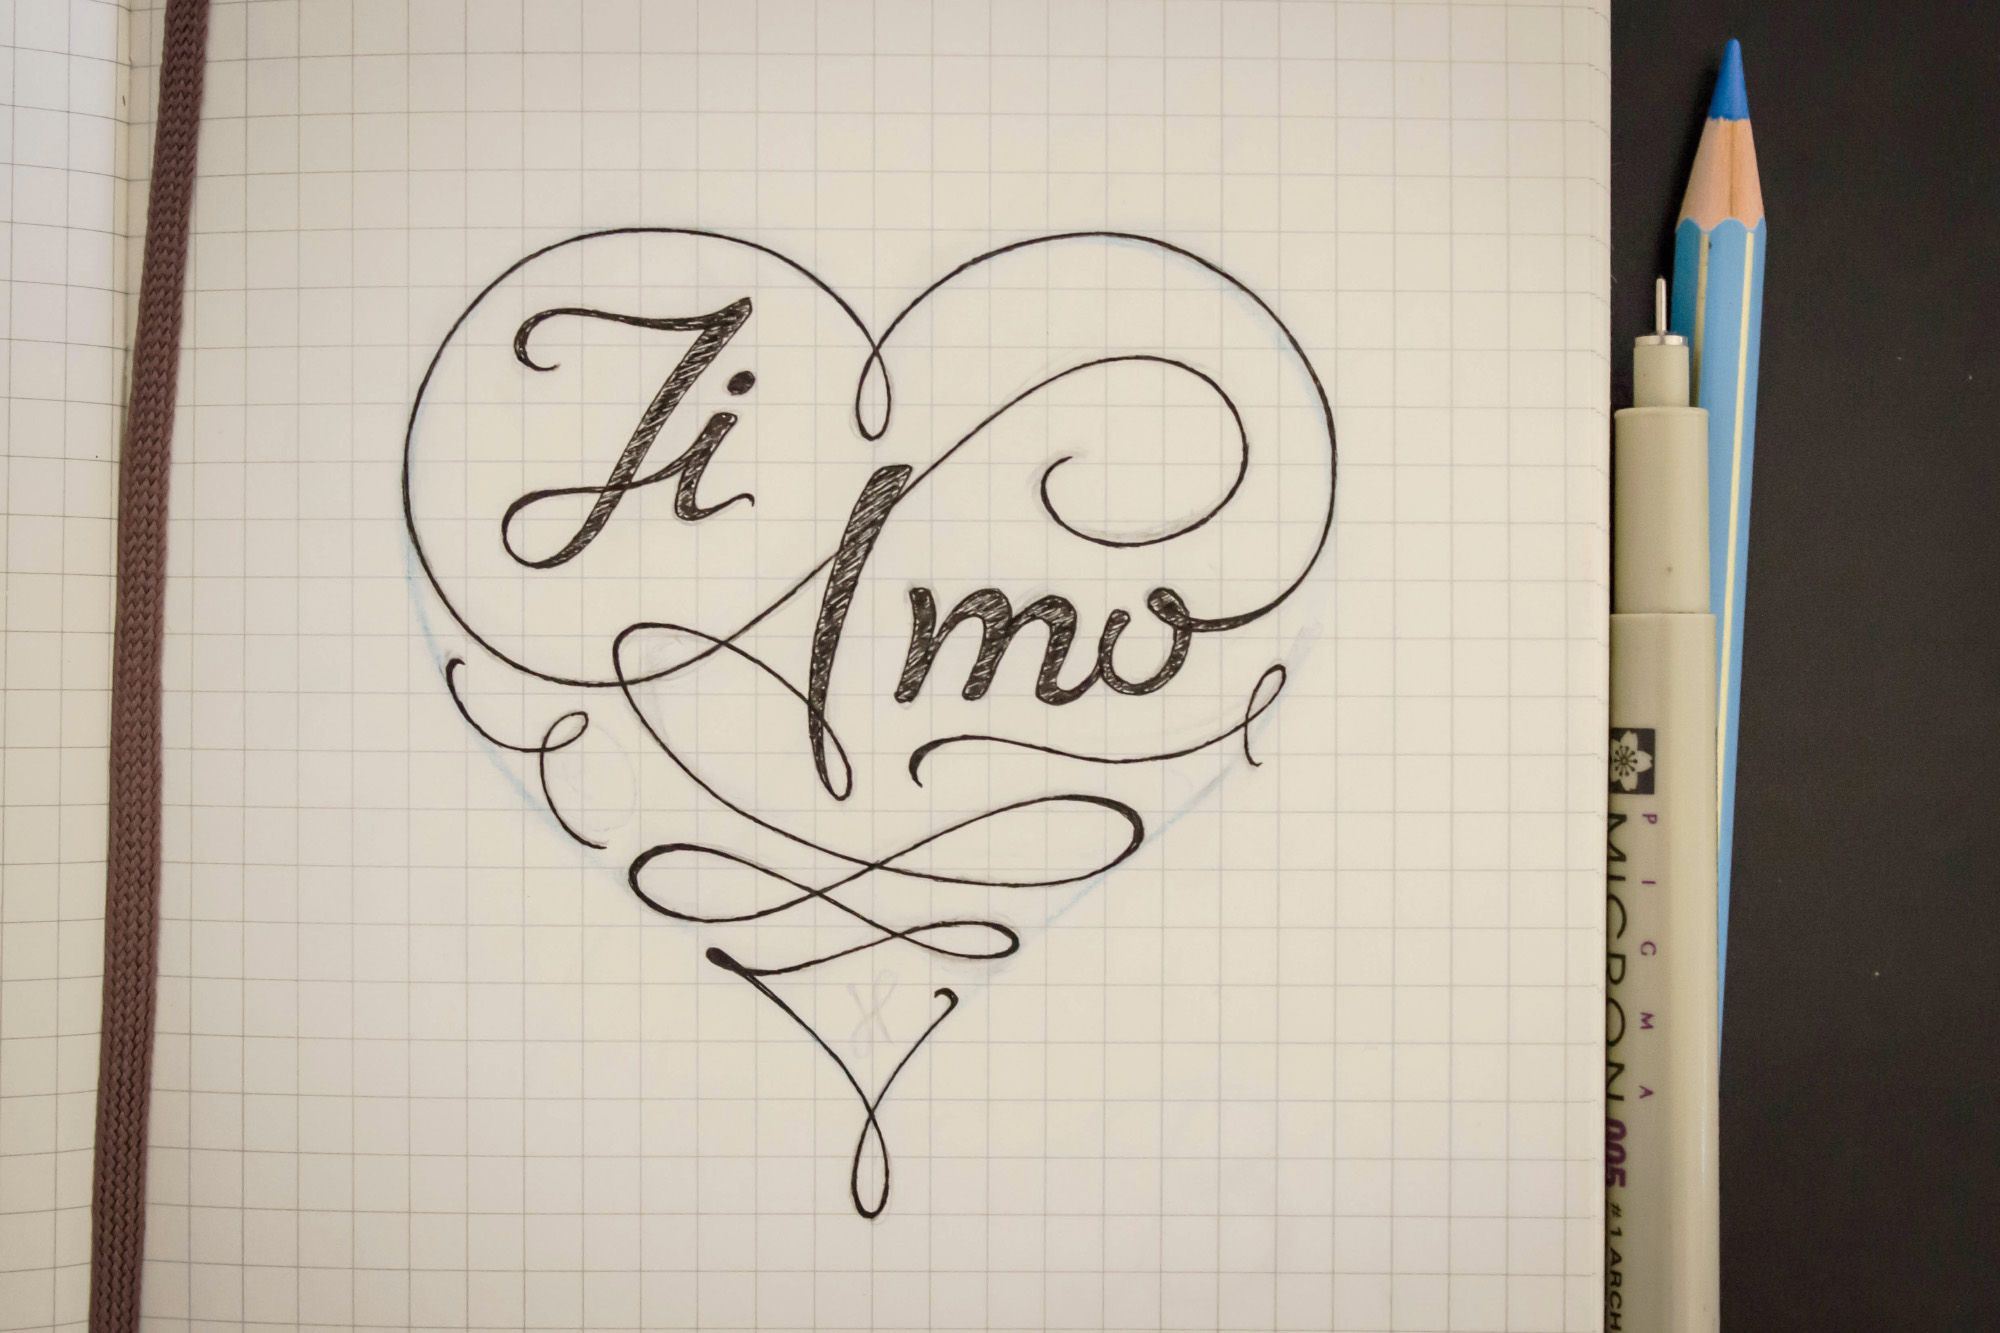 Ti Amo By Gershom Charig Sketch Idee Album Foto Fai Da Te